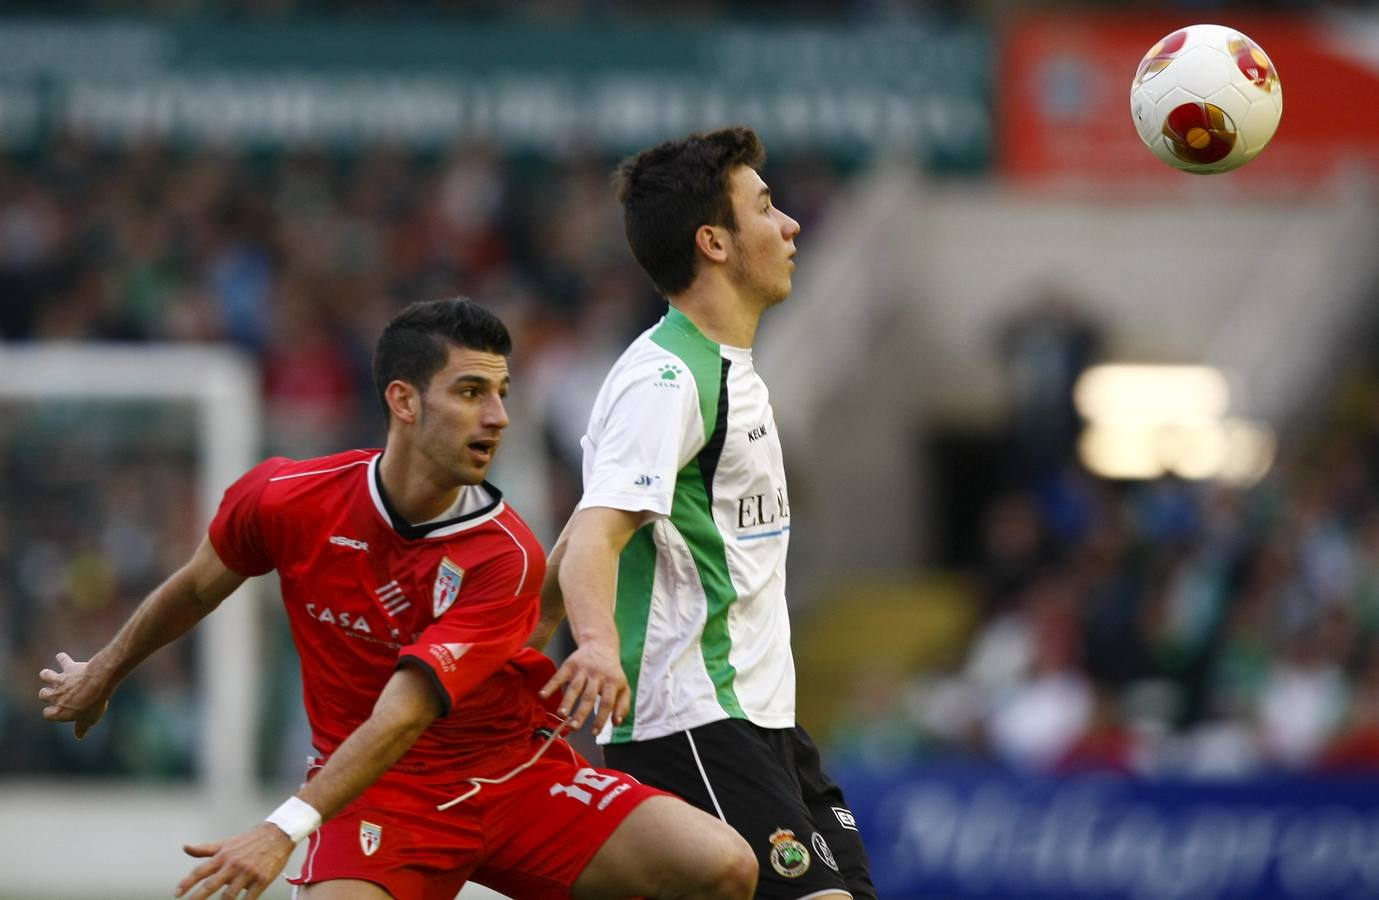 Racing - Compostela (I)